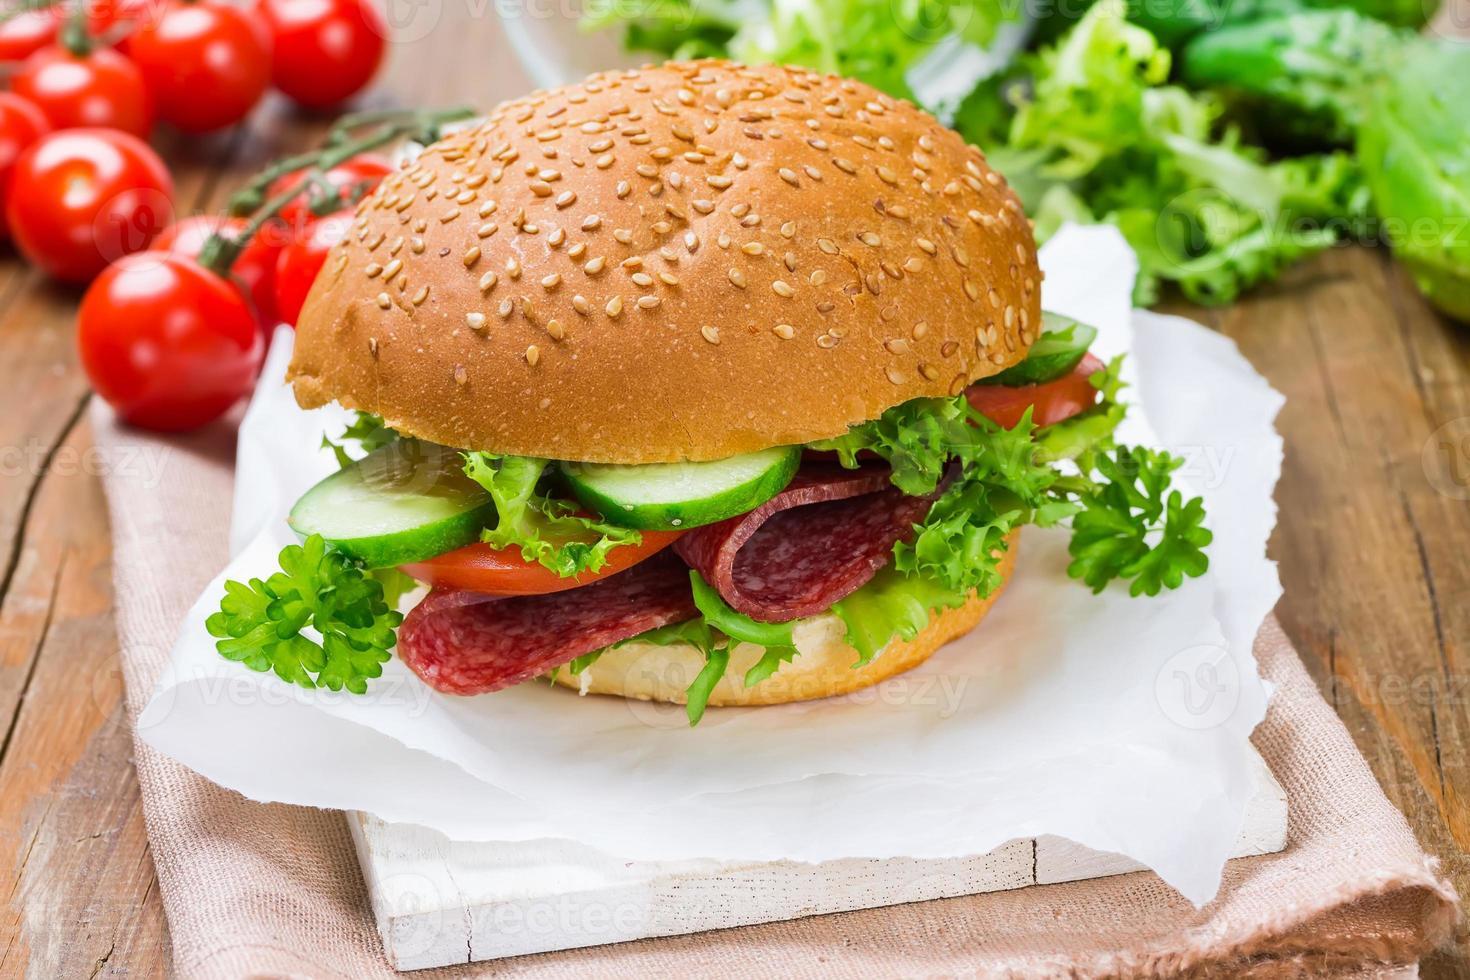 sanduíche com presunto e legumes foto